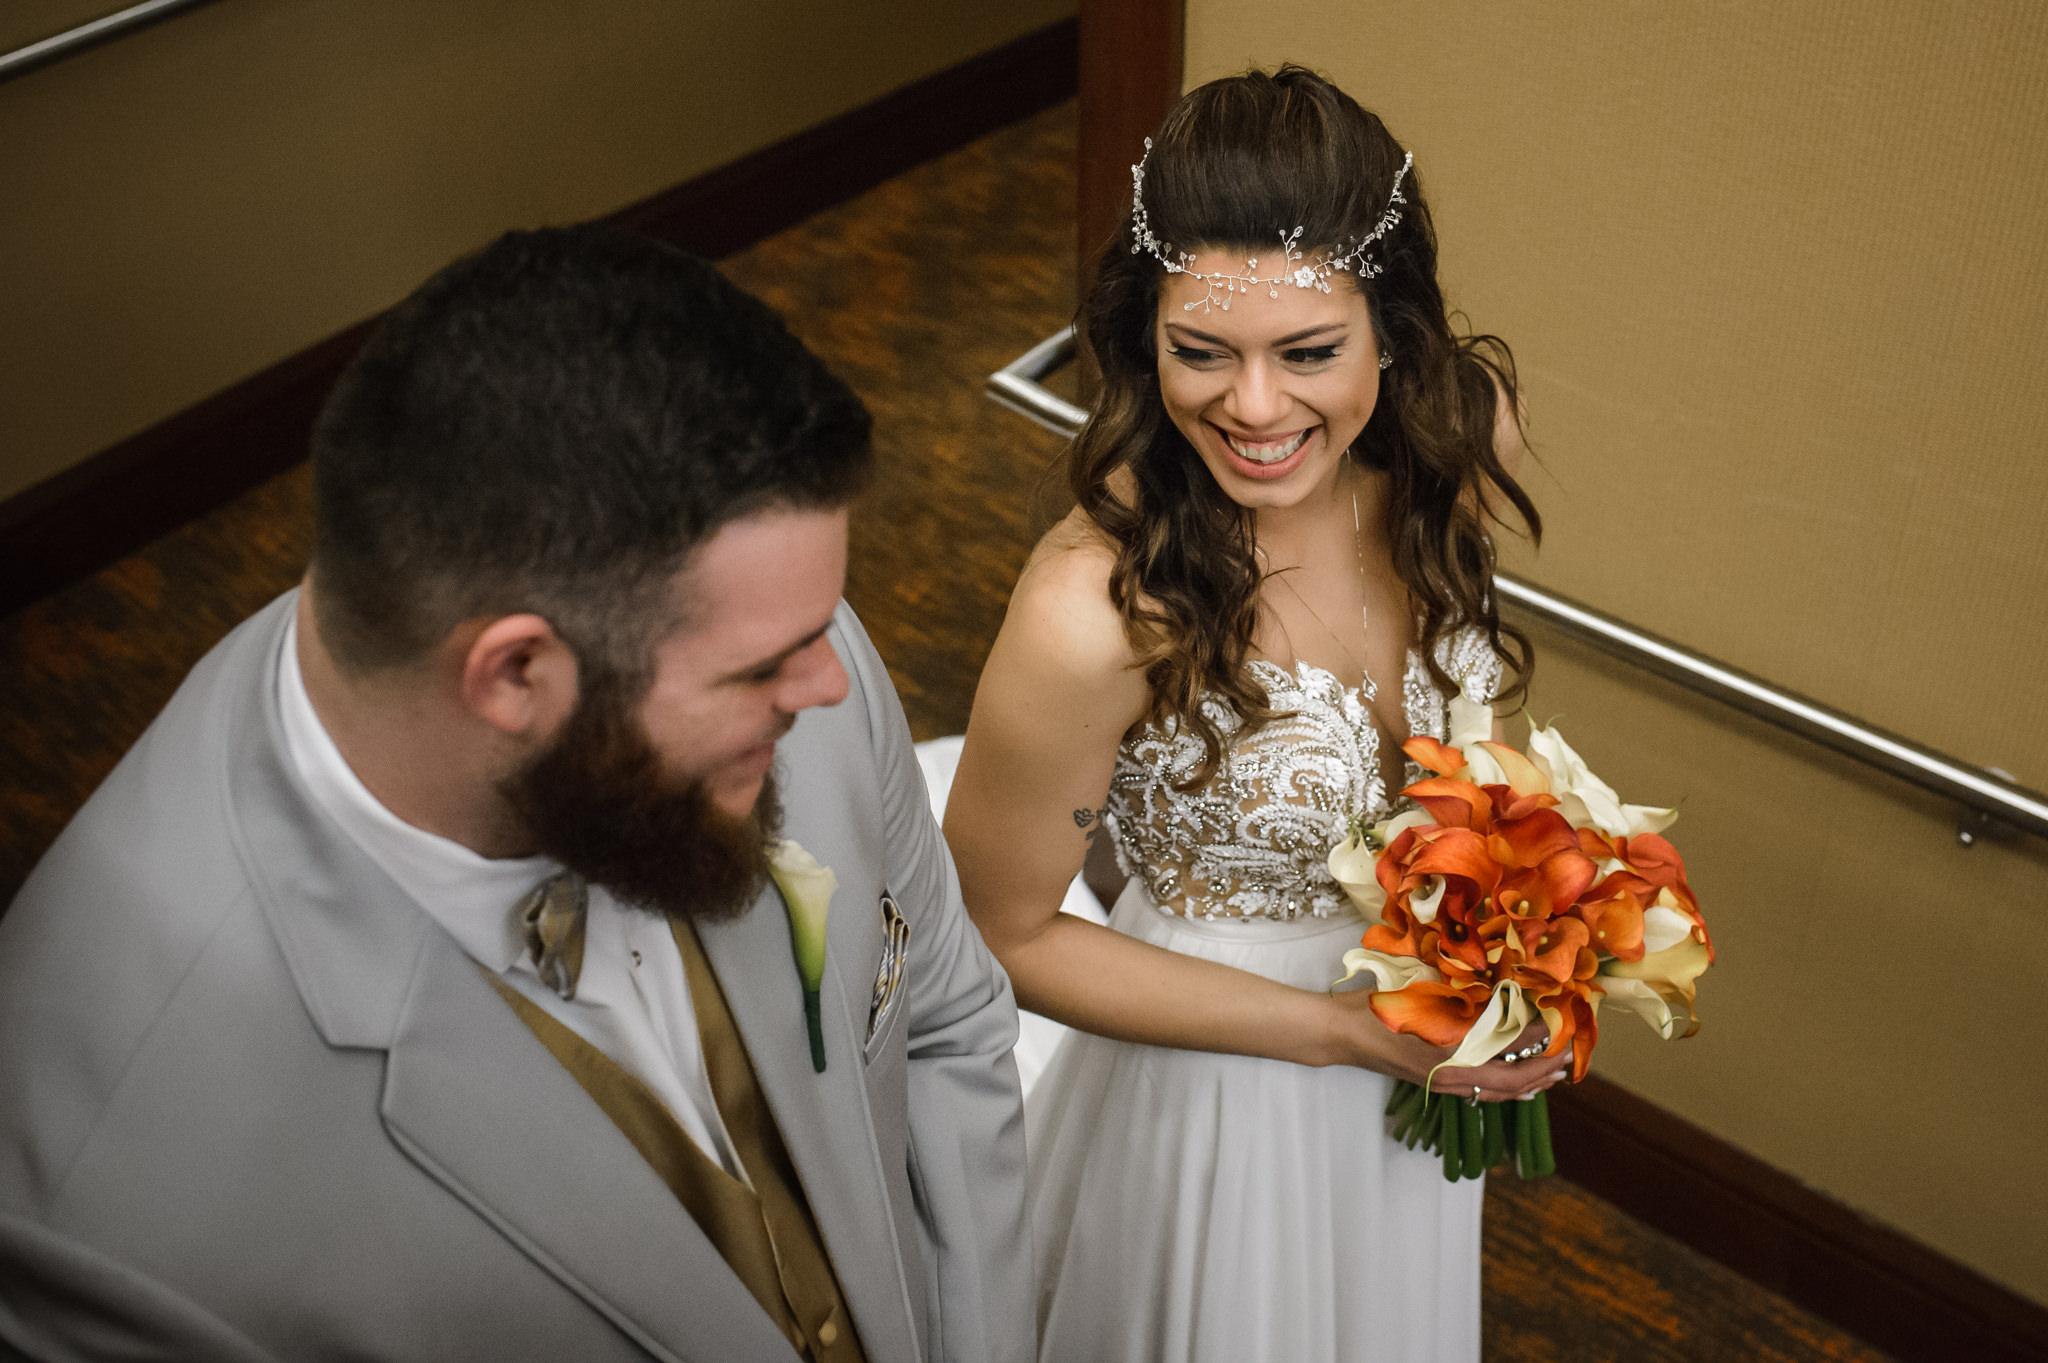 HILTON-OMAHA-WEDDING-PHOTOGRAPHER-JM-STUDIOS-OMAHA-LIV-BRICE-022.jpg